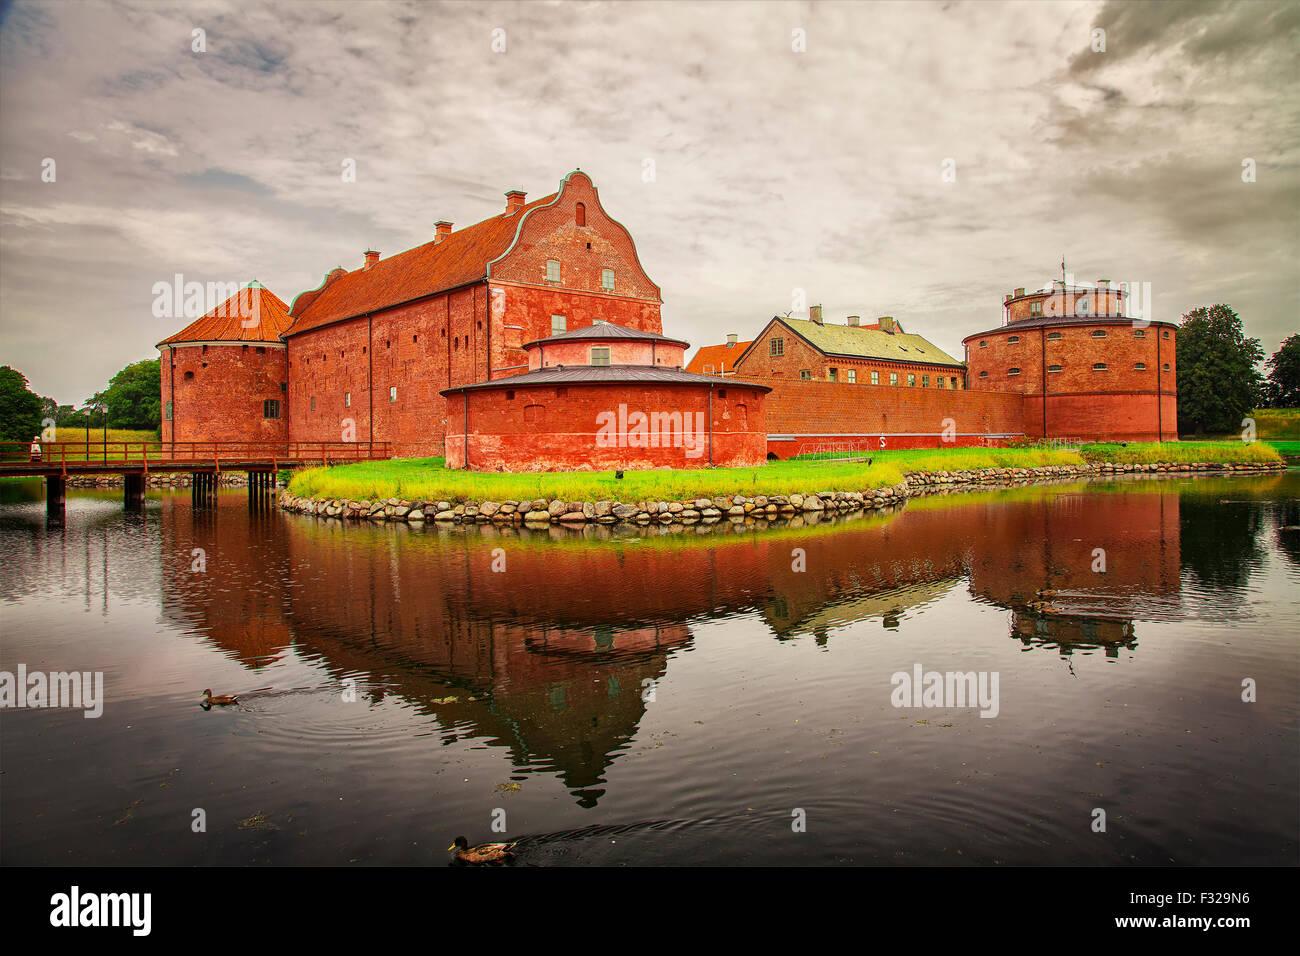 Image of the fortified Landskrona Citadel, built in the 1600s. Skane, Sweden. Stock Photo